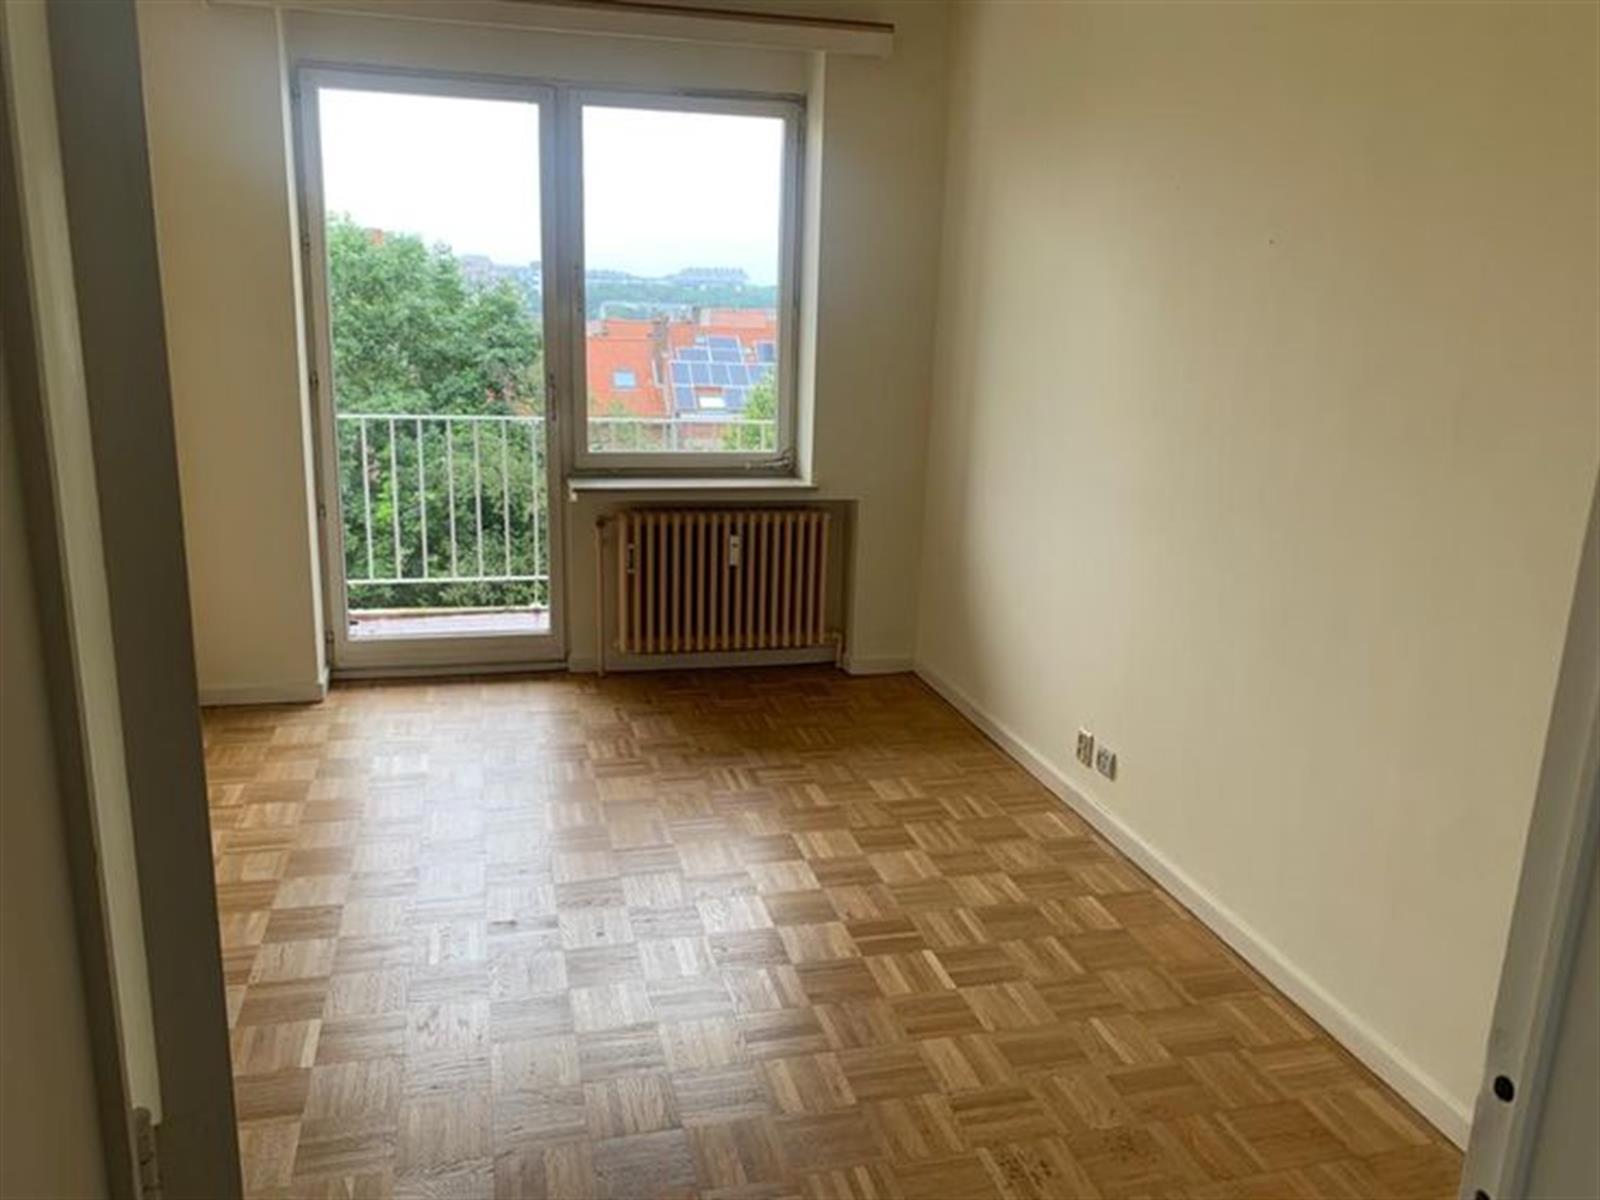 Appartement - Woluwe-Saint-Lambert - #4399349-7